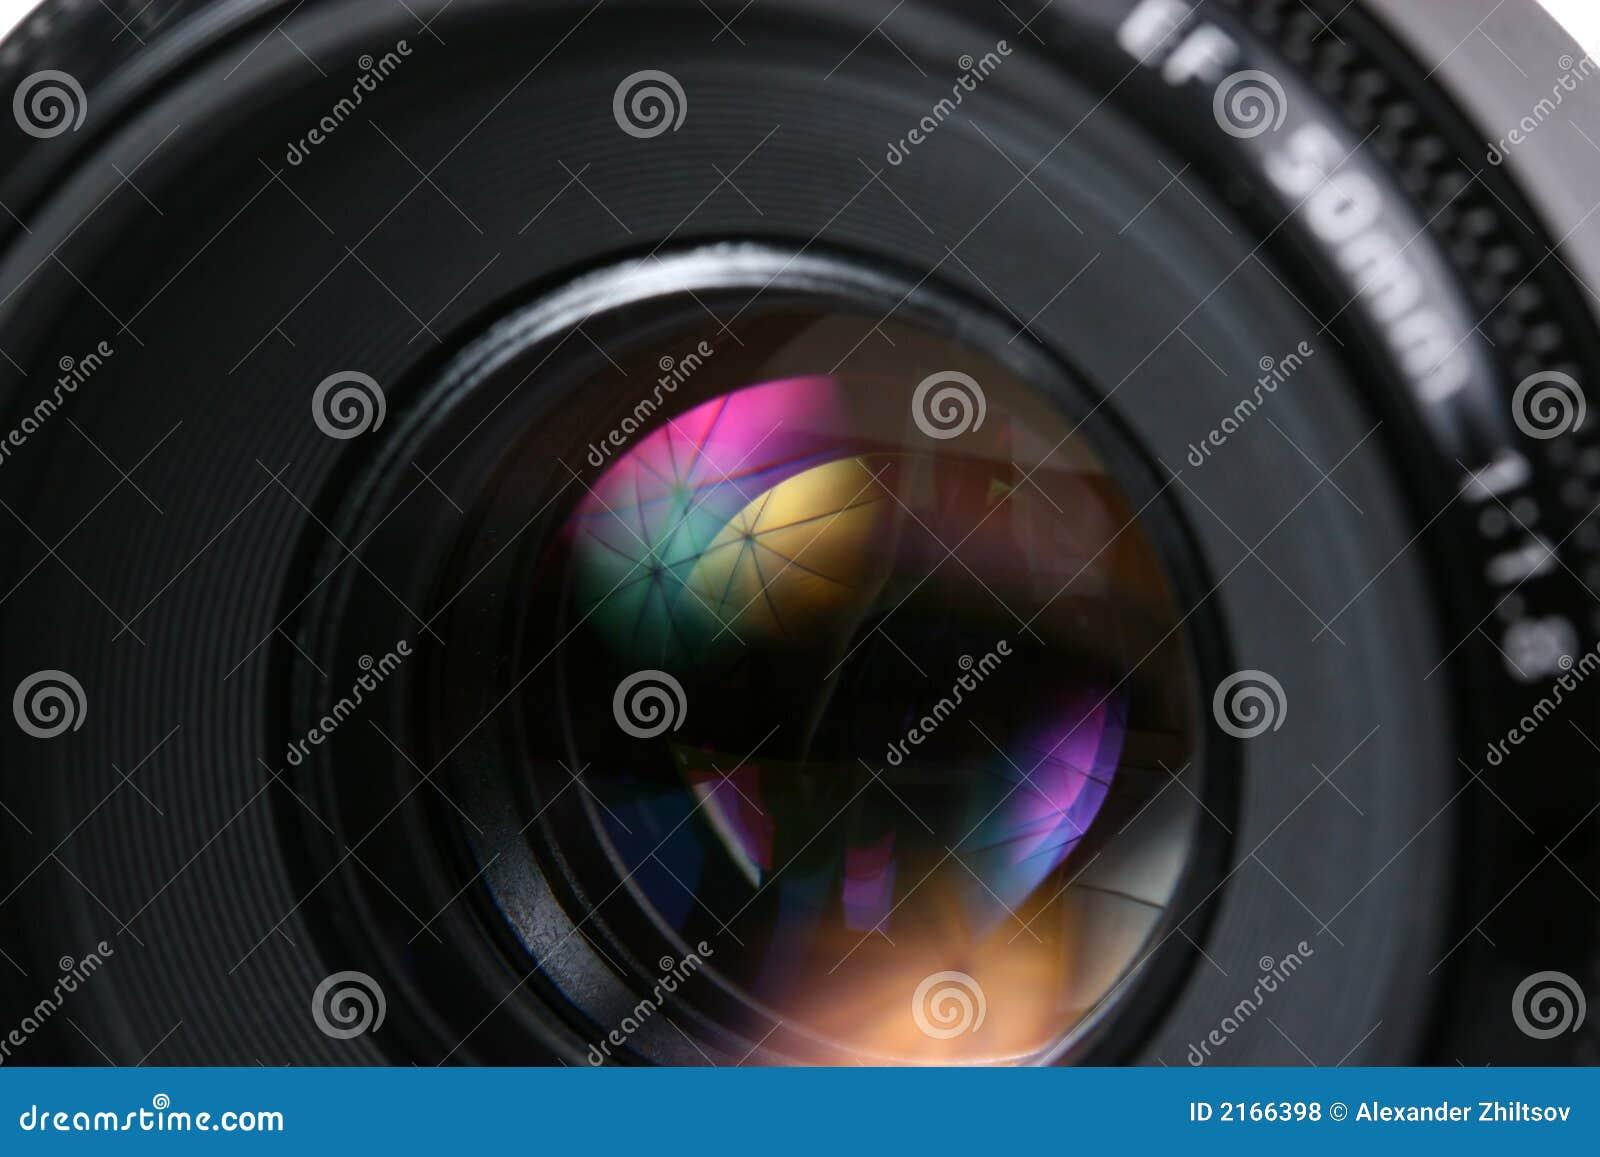 Lensefoto